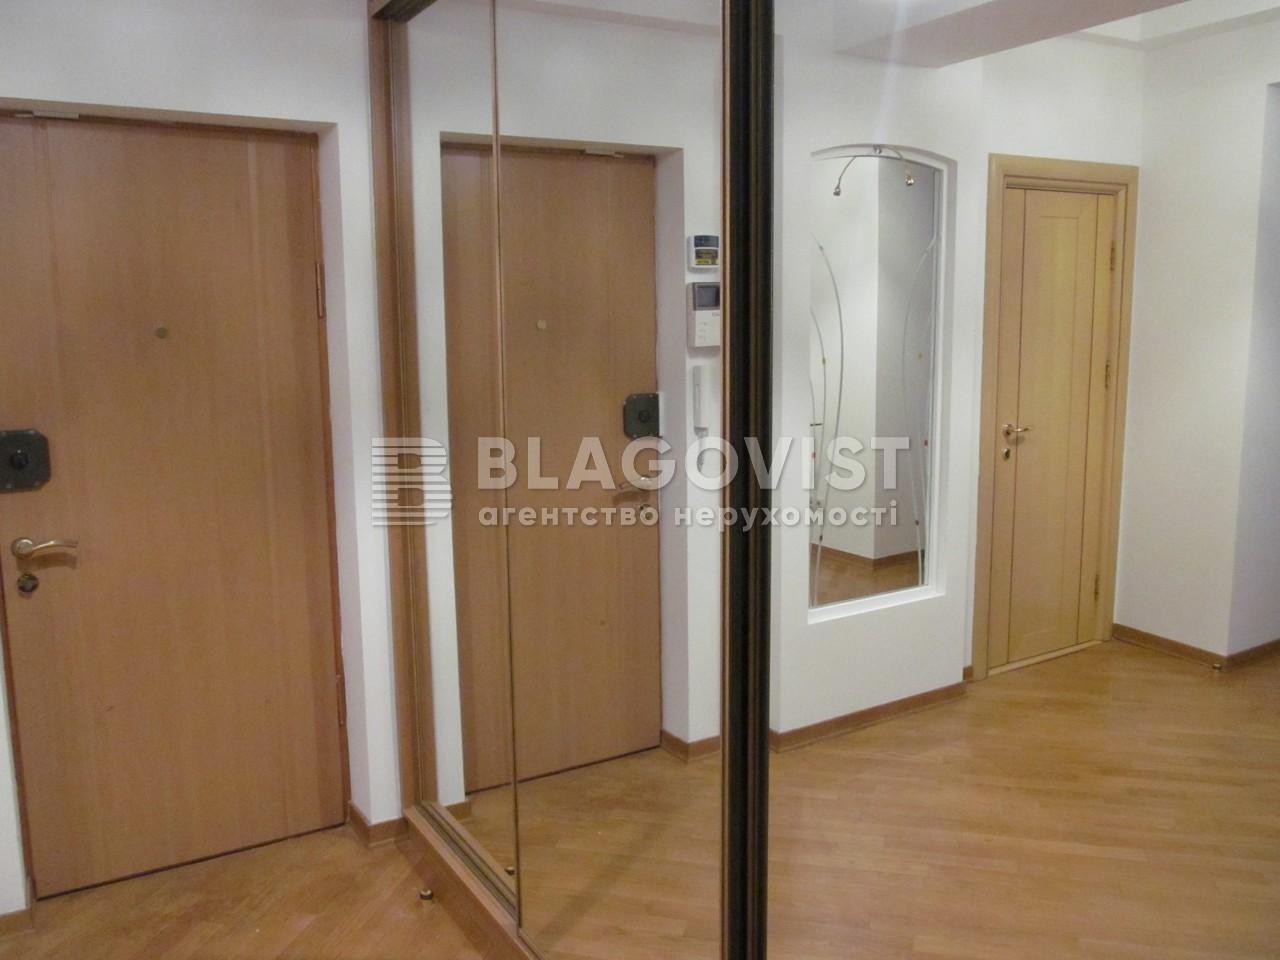 Квартира E-40467, Тургеневская, 52/58, Киев - Фото 35